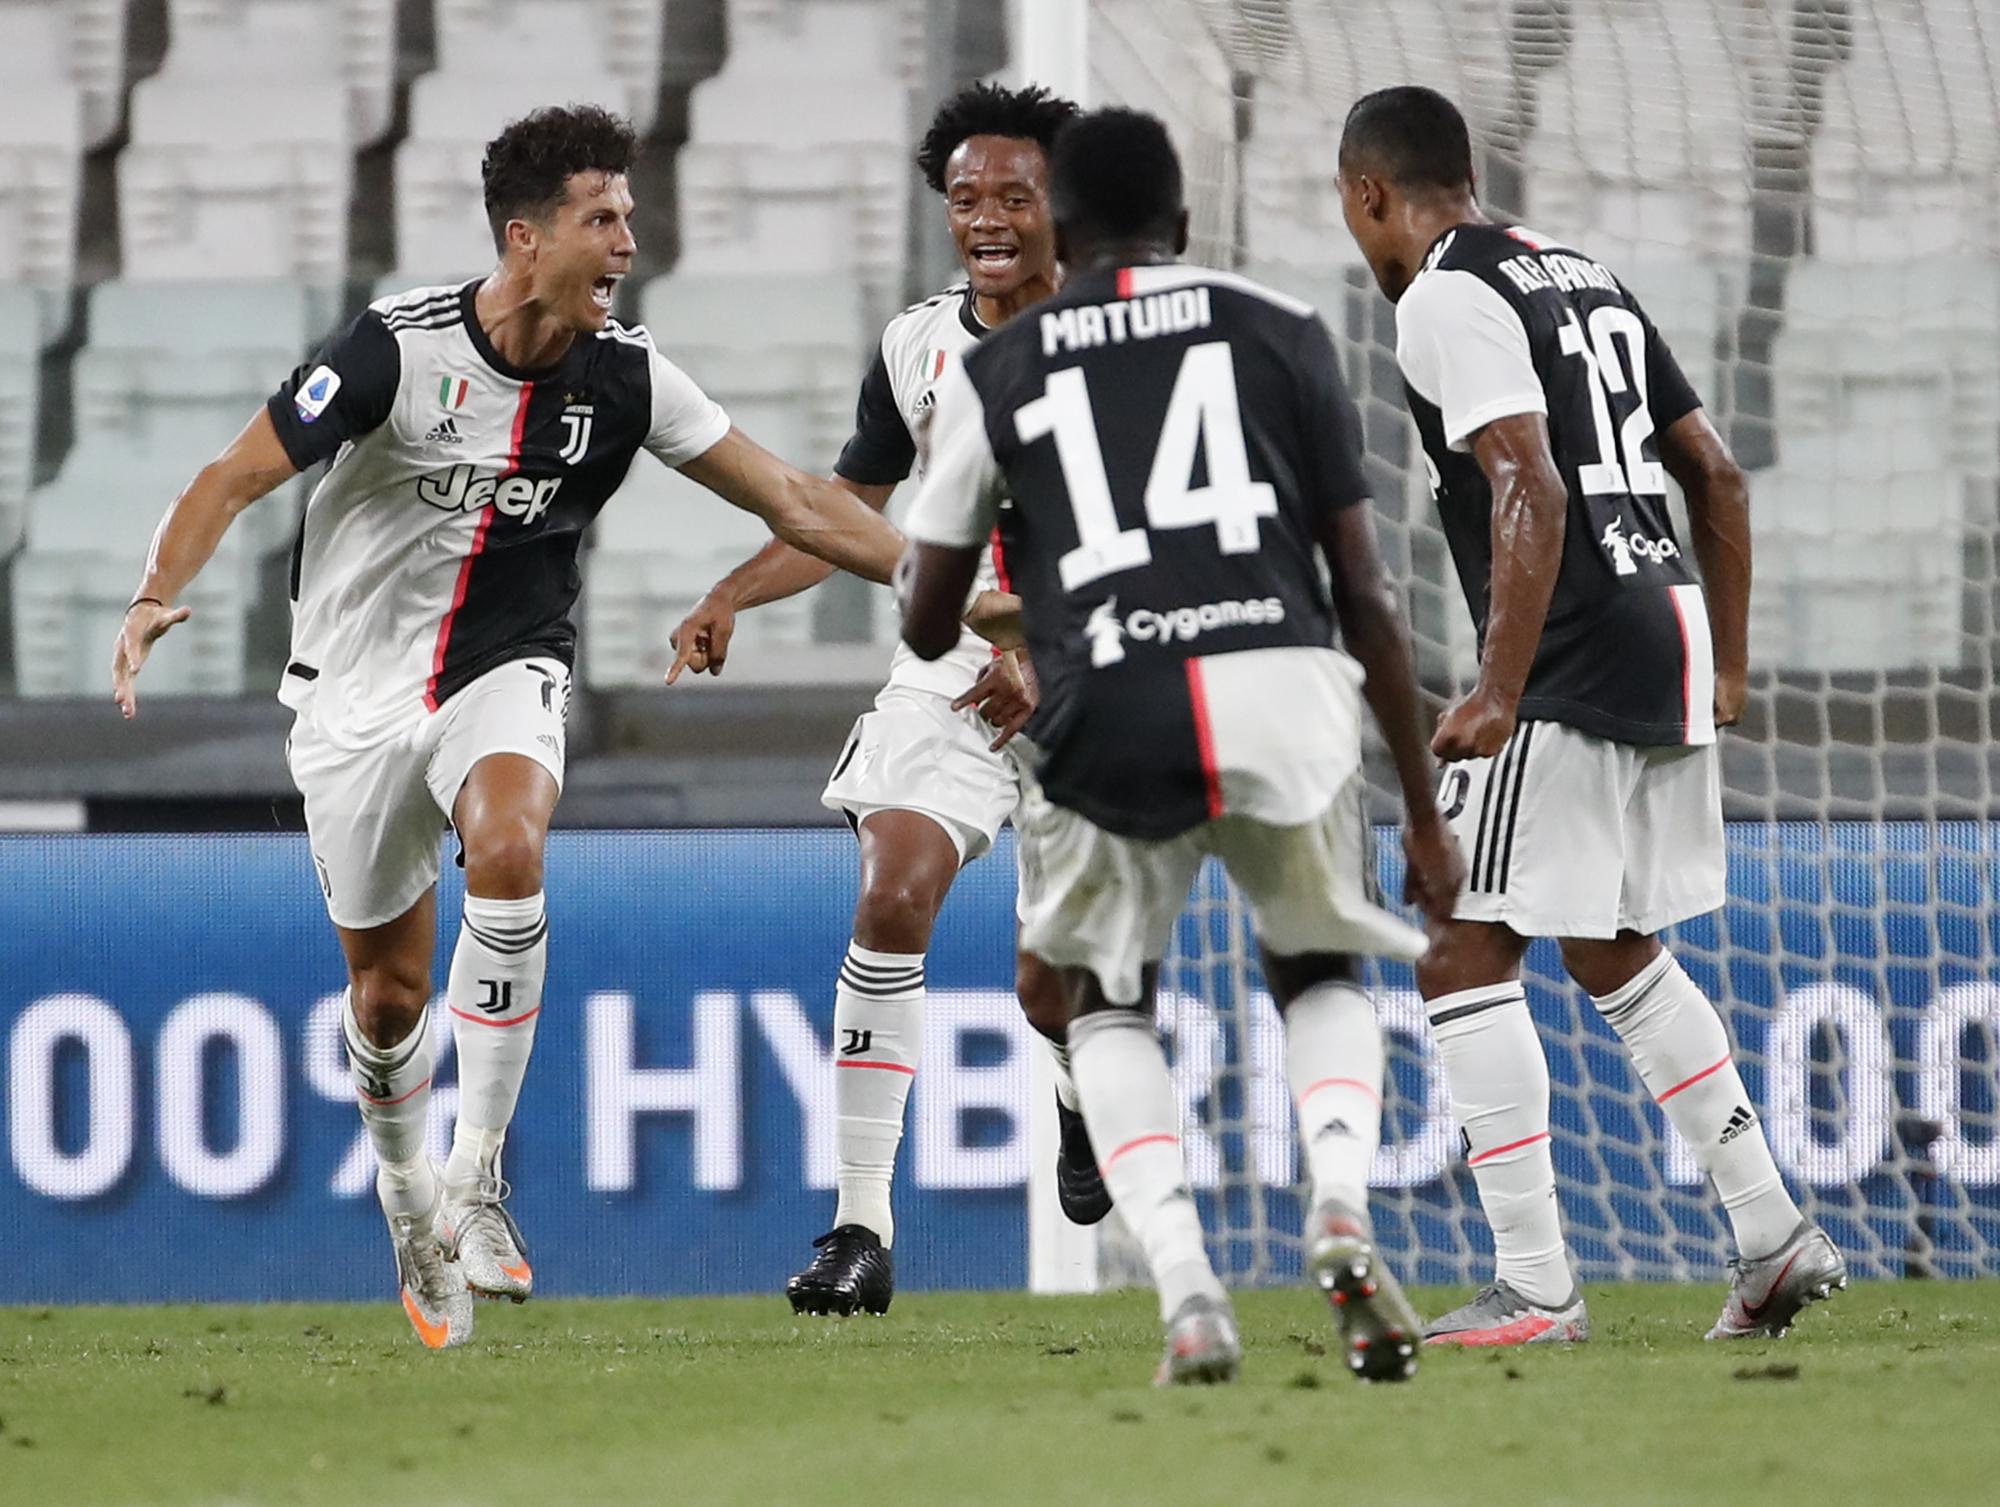 Cagliari Vs Juventus Live Stream 7 29 20 Watch Serie A Online Time Usa Tv Channel Nj Com